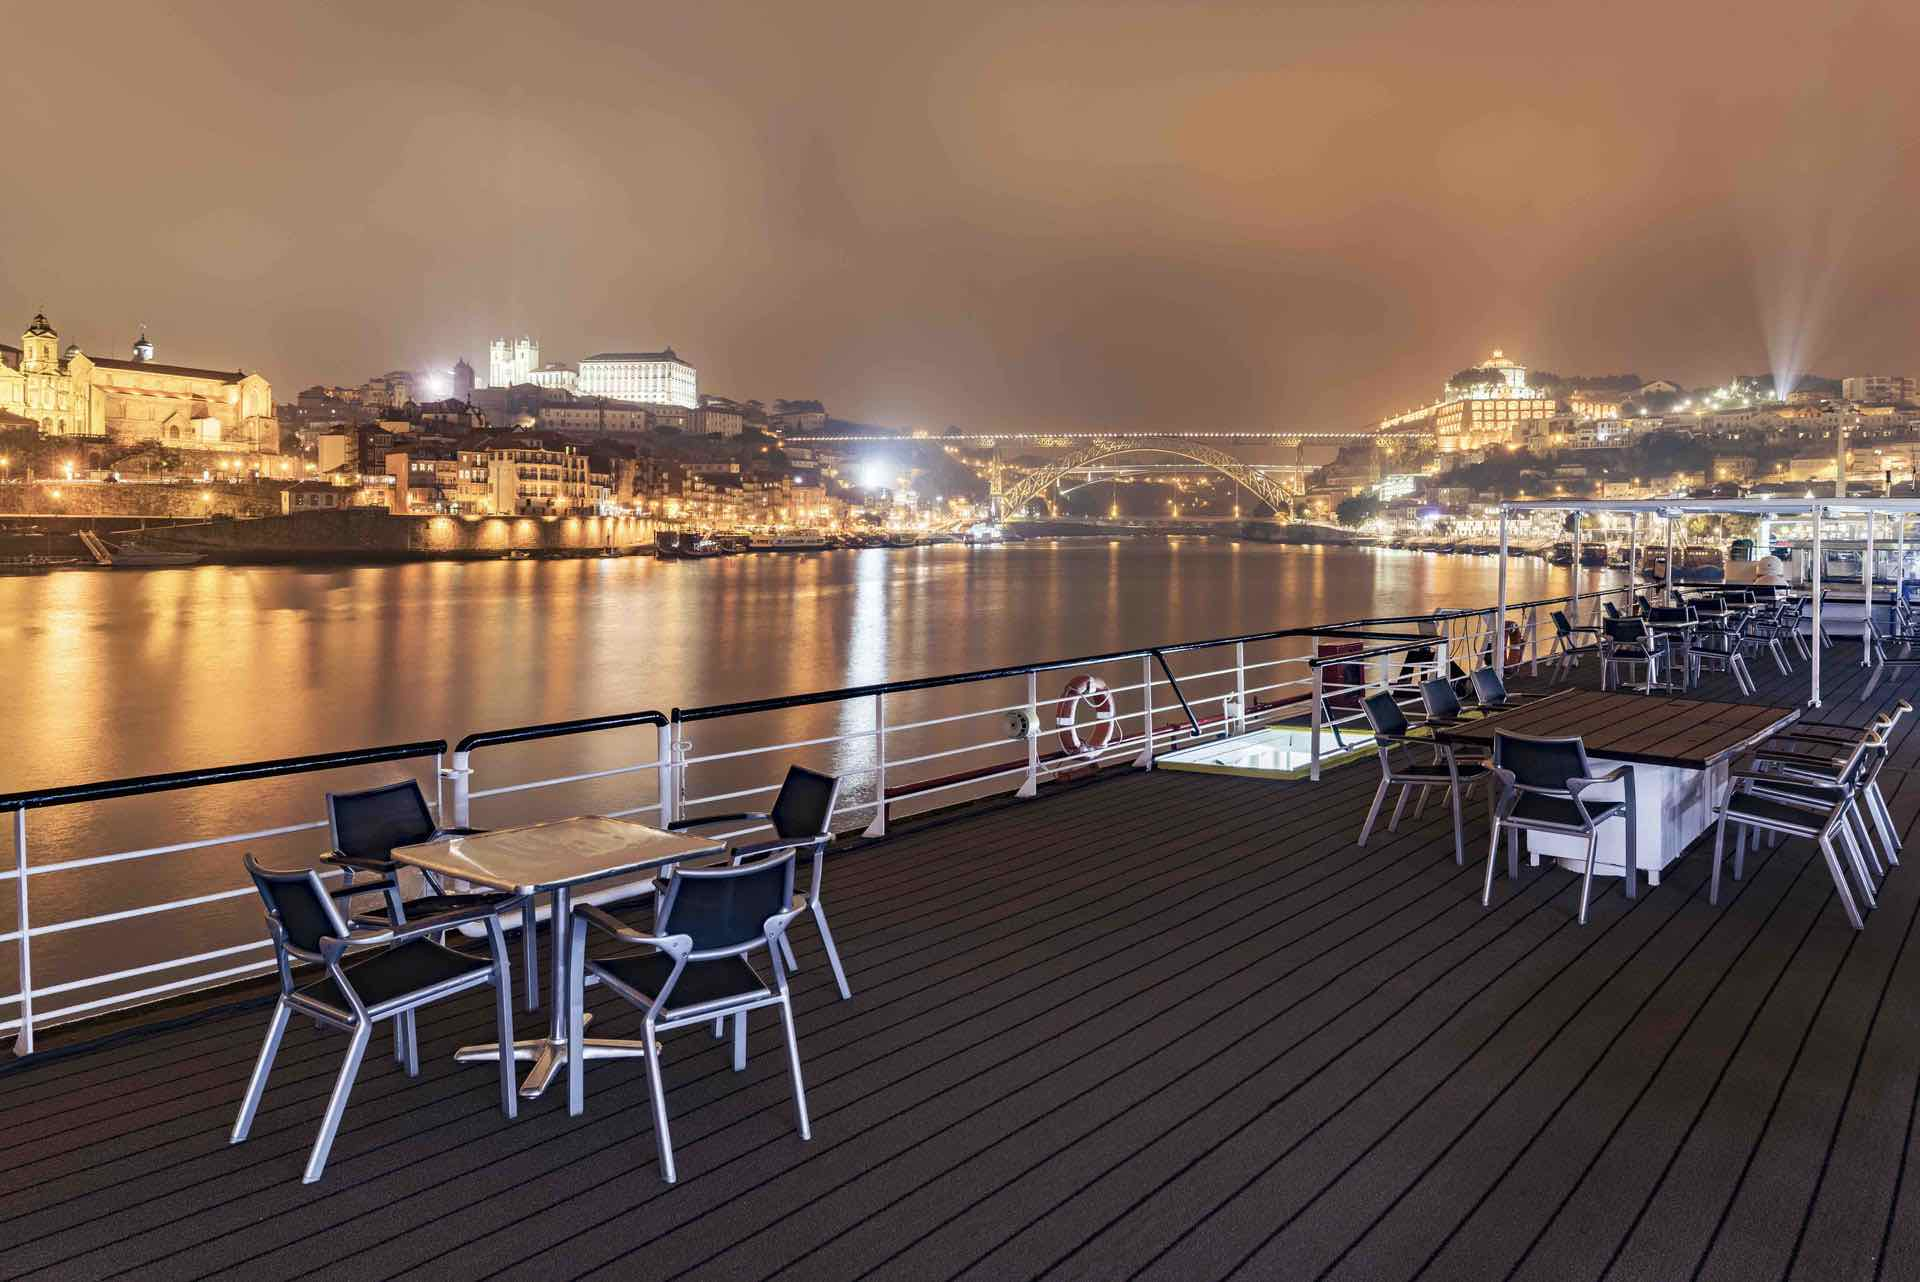 MS Douro Prince Sonnendeck